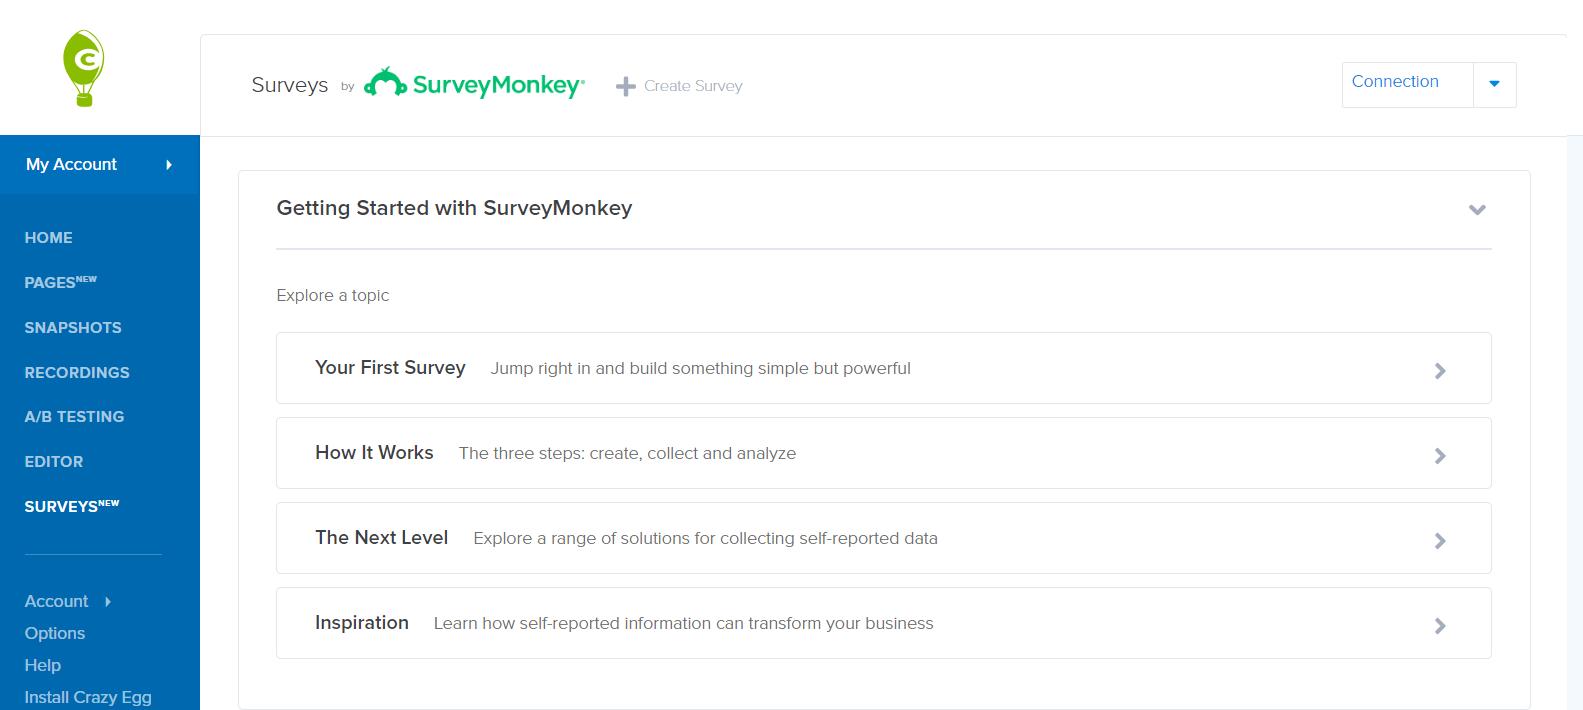 SurveyMonkey Integration - Crazy Egg   Help Center and